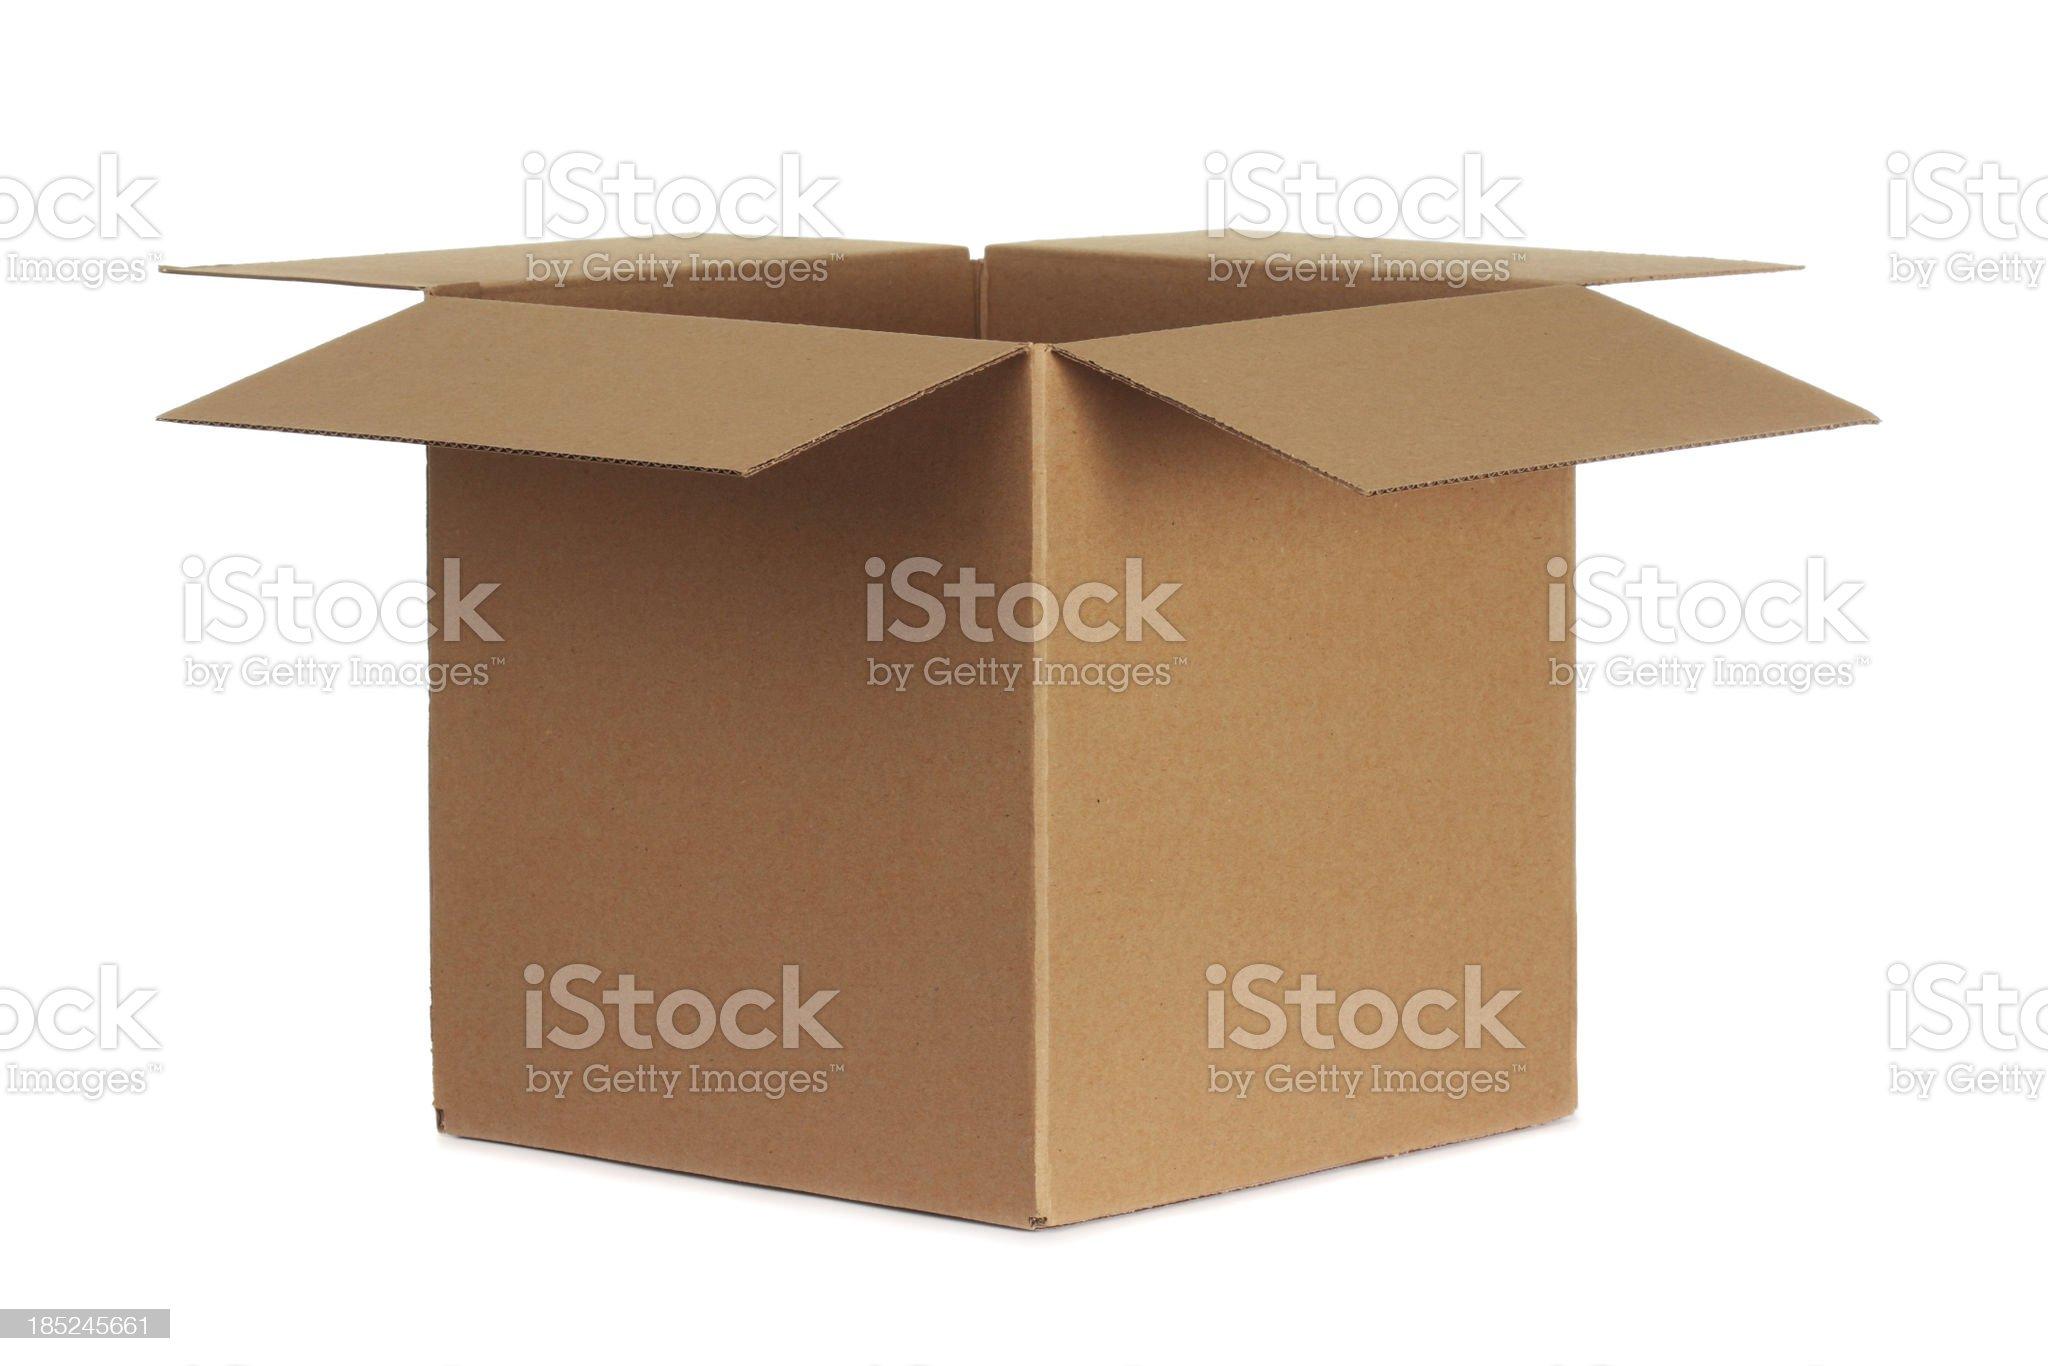 Blank Cardboard Box royalty-free stock photo